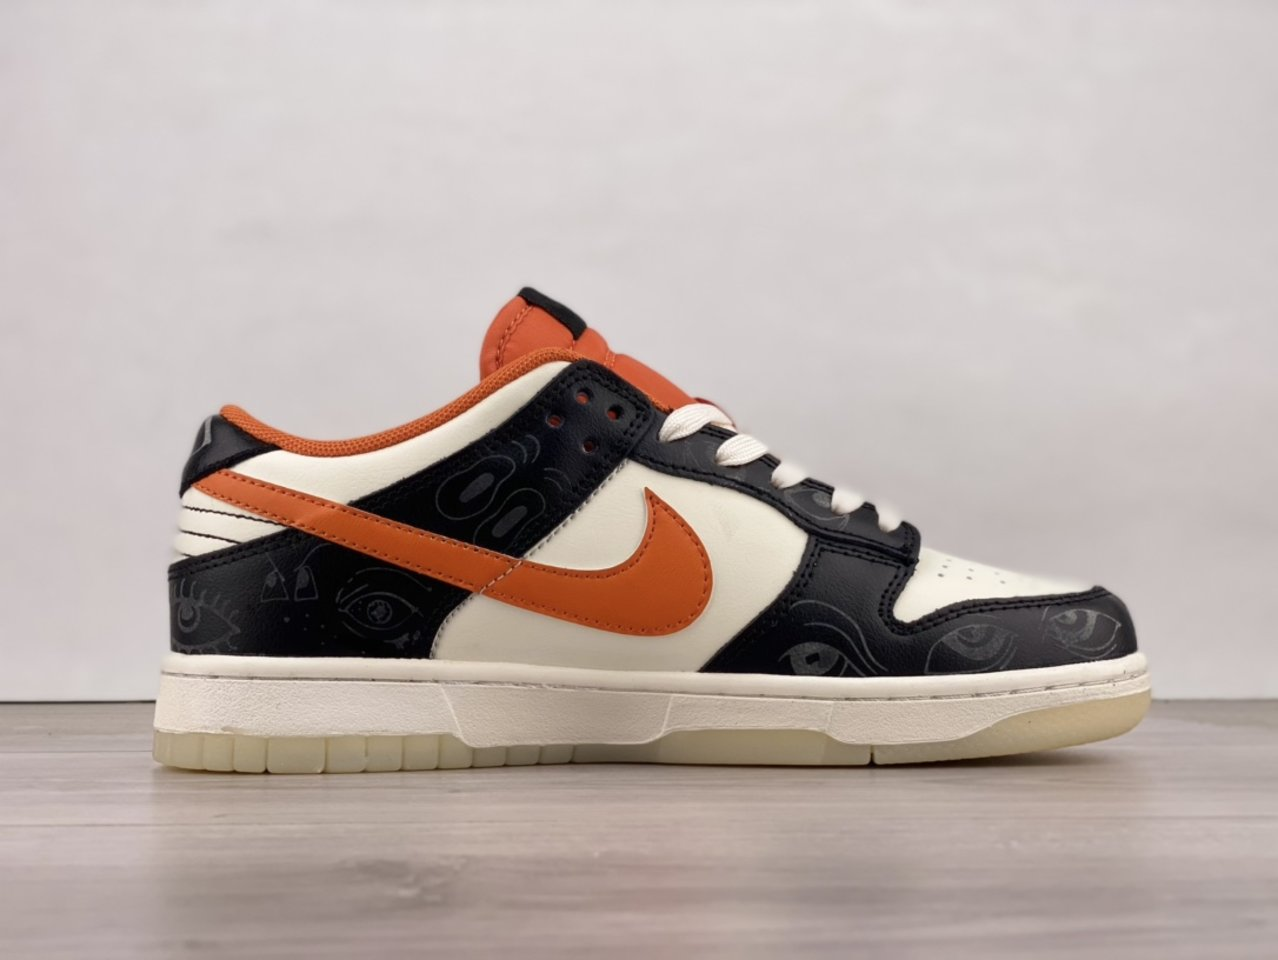 2021 Nike Dunk Low PRM Halloween Skateboard Shoes DD3357-100 Sell